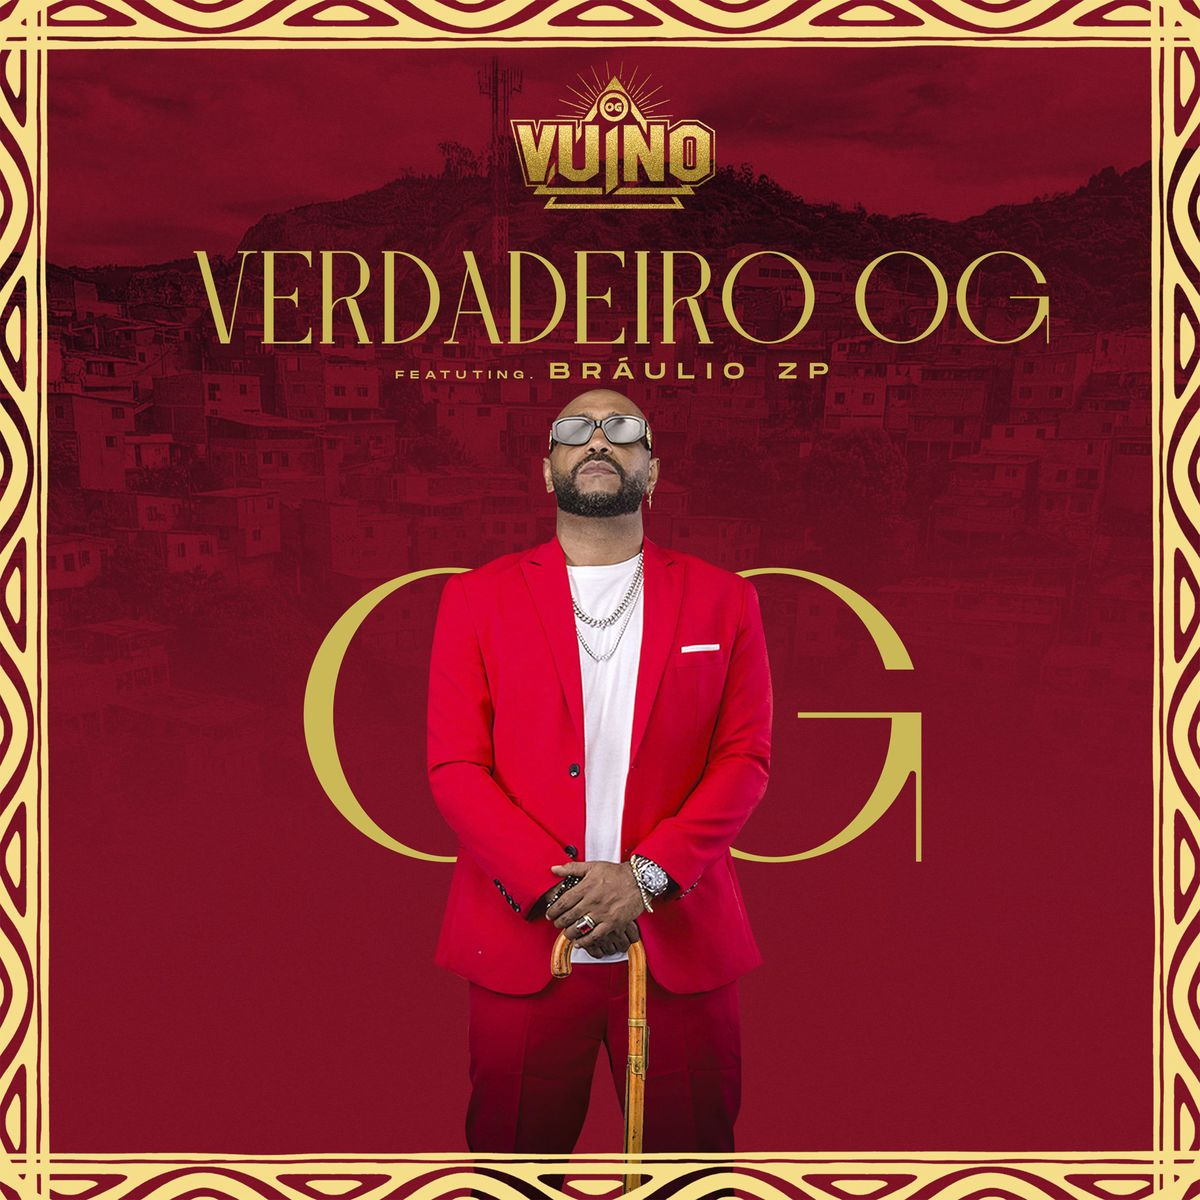 OG Vuino - Verdadeiro OG (feat. Bráulio ZP)